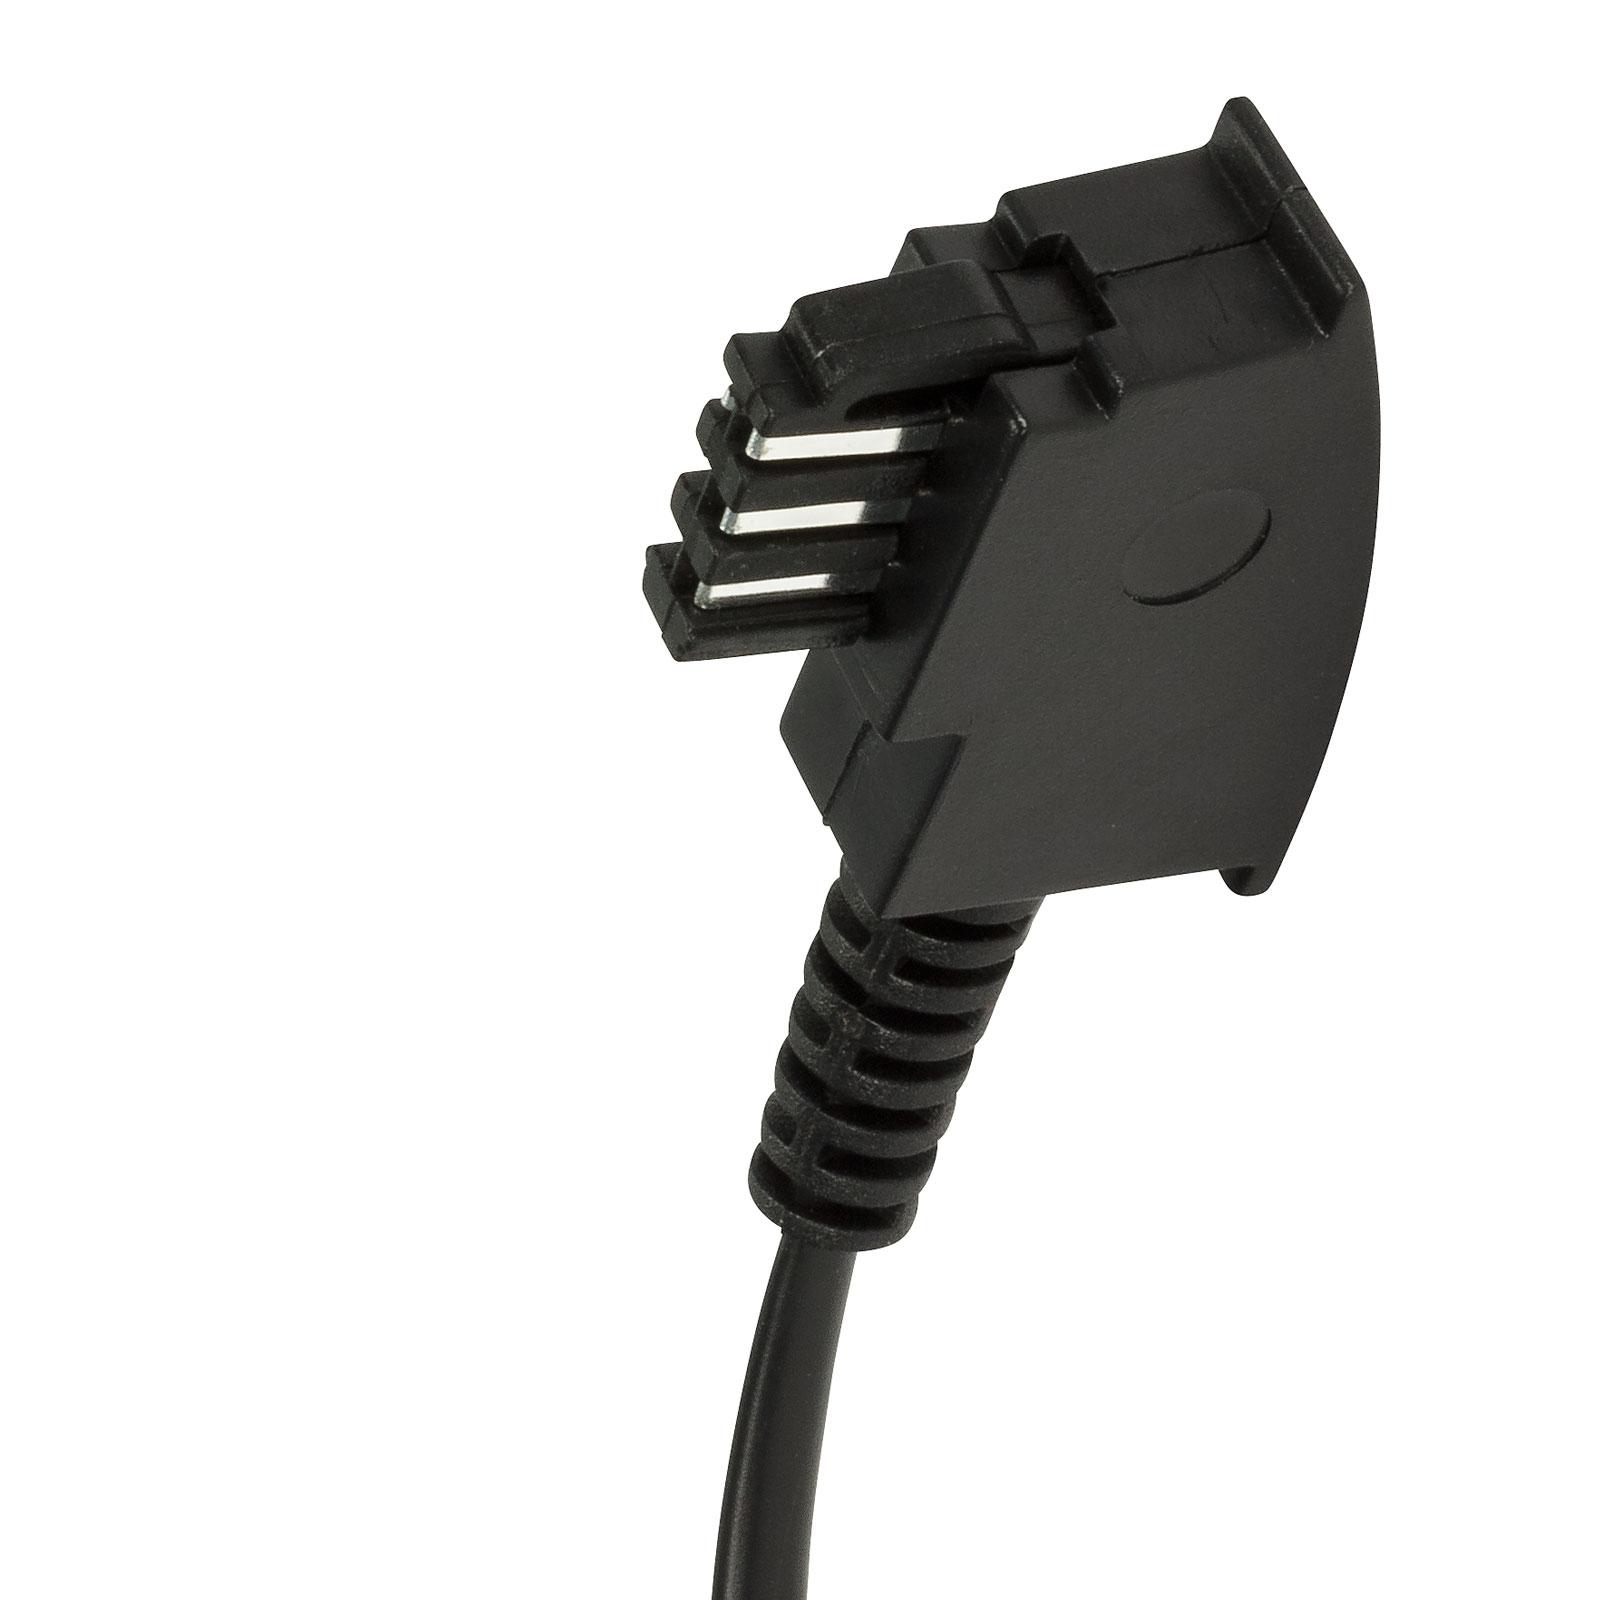 /> RJ11 Telekom Siemens Belegung Fernsprechen 15m Telefon Kabel TAE-F Stecker